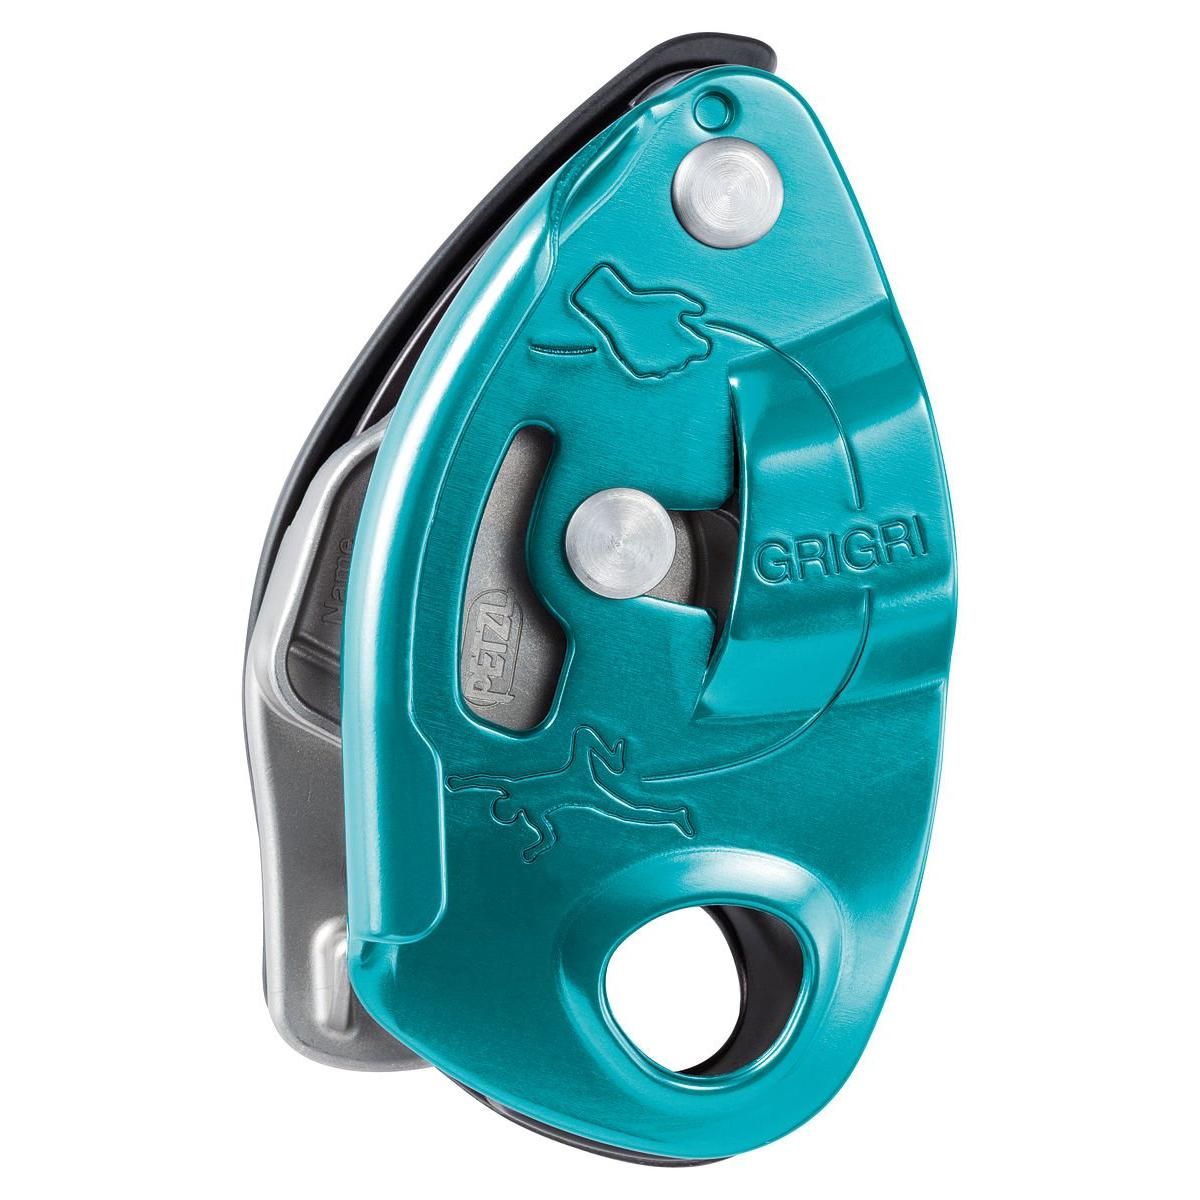 Petzl Charlet Petzl GriGri Belay Device - Blue